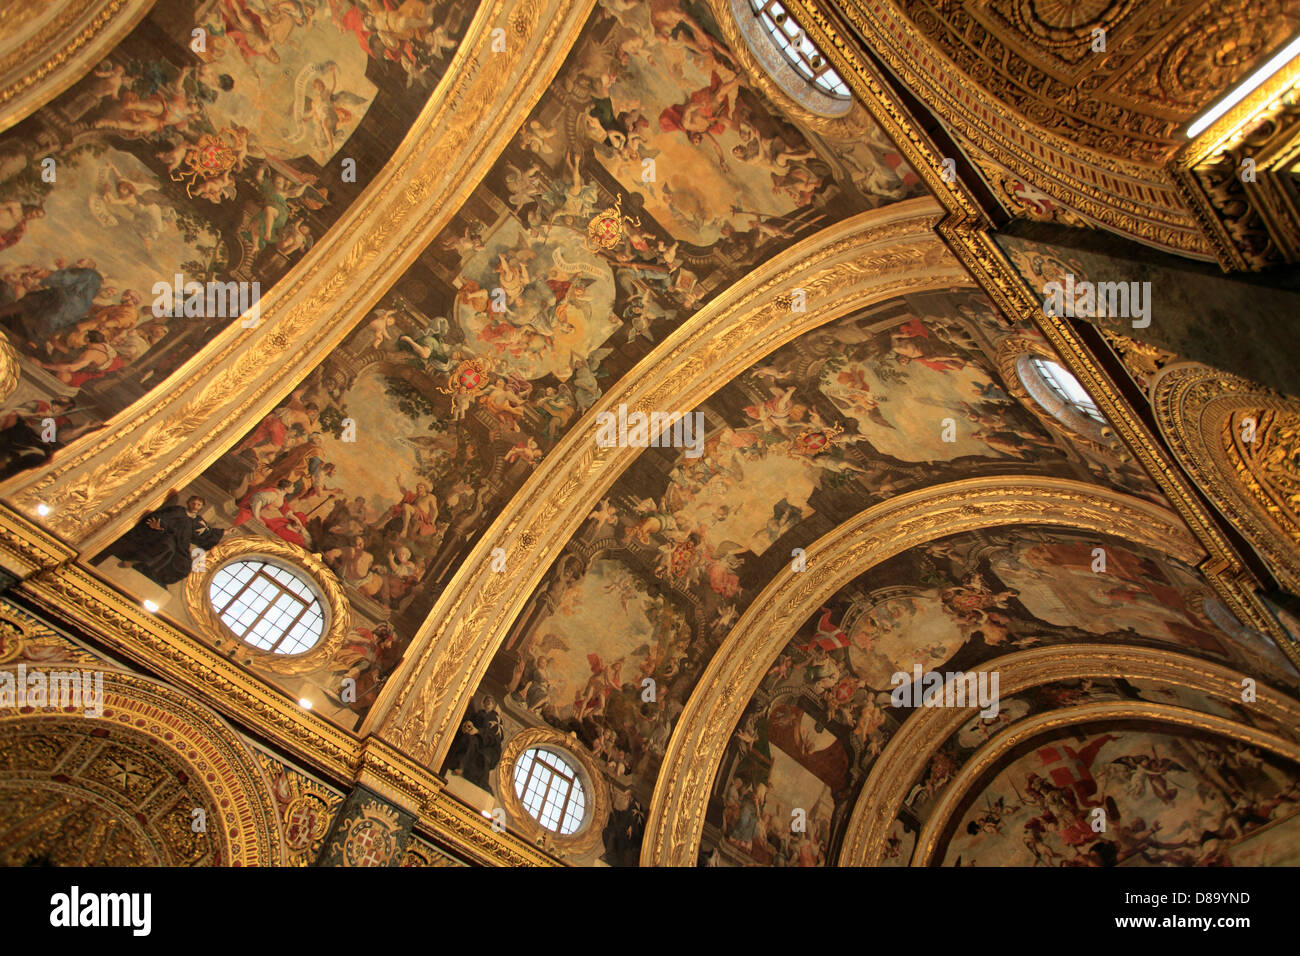 Malta, Valletta, St John's Co-Cathedral, interior, - Stock Image